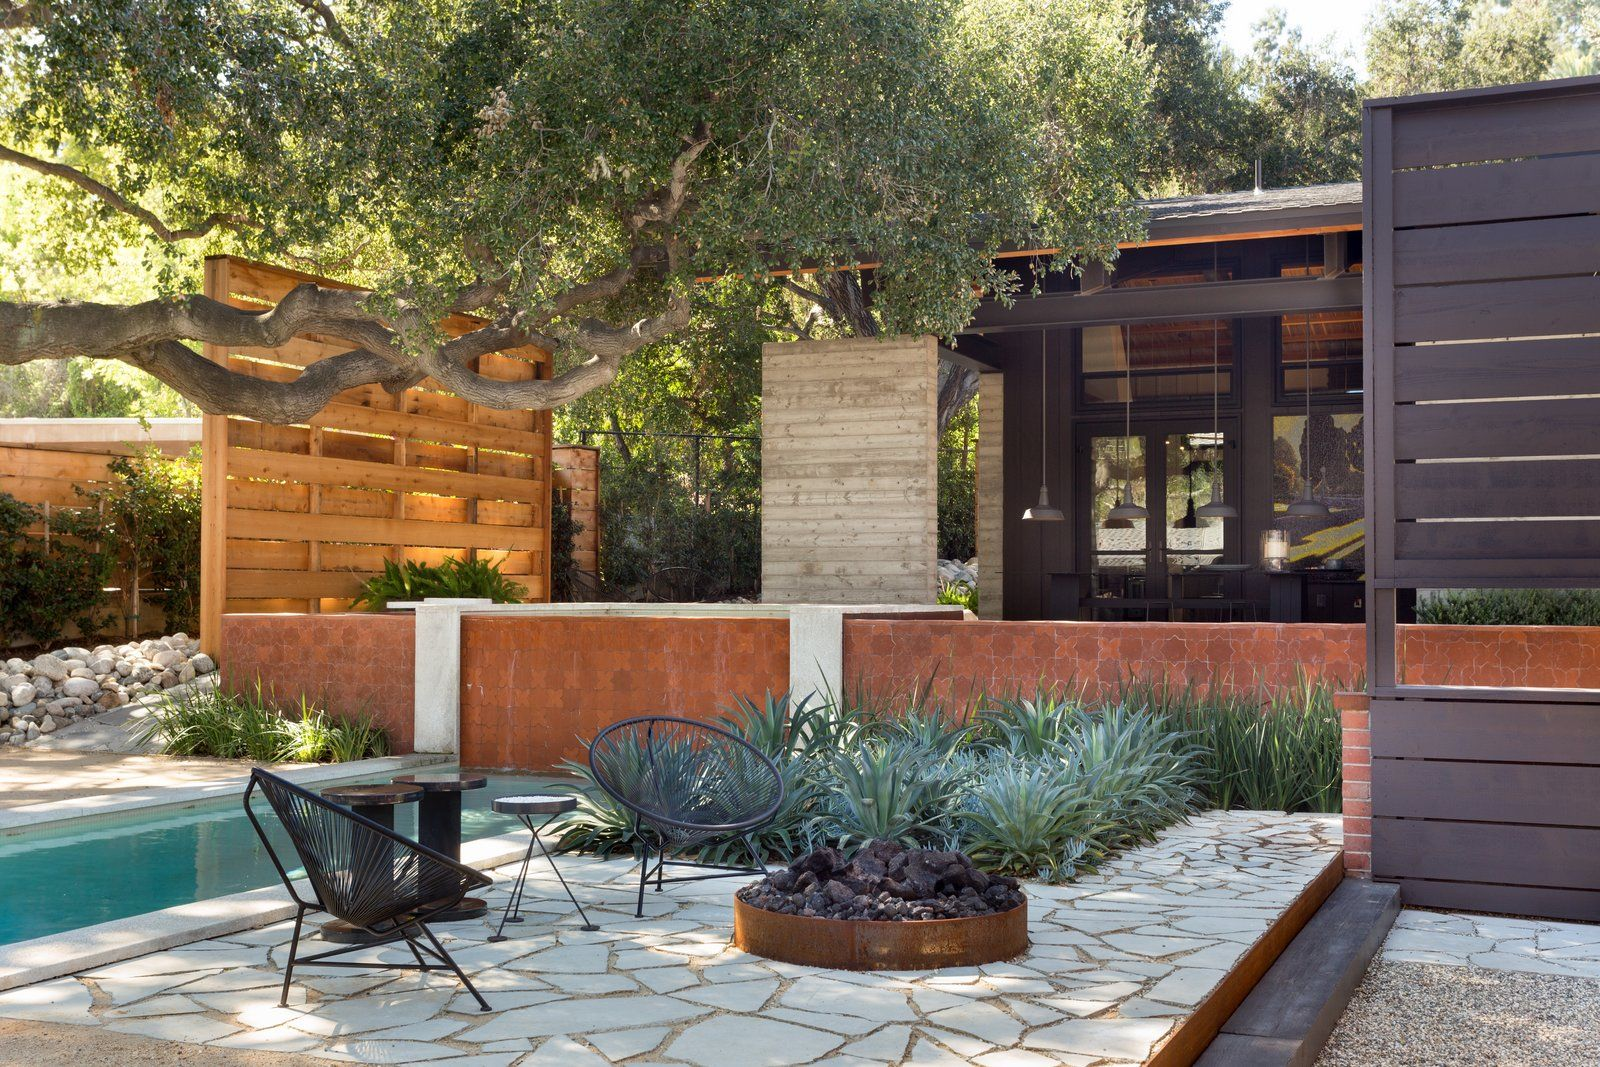 6 Backyard Landscape Designs That Need Minimal Maintenance Backyard Landscaping Designs Large Backyard Landscaping Modern Landscaping